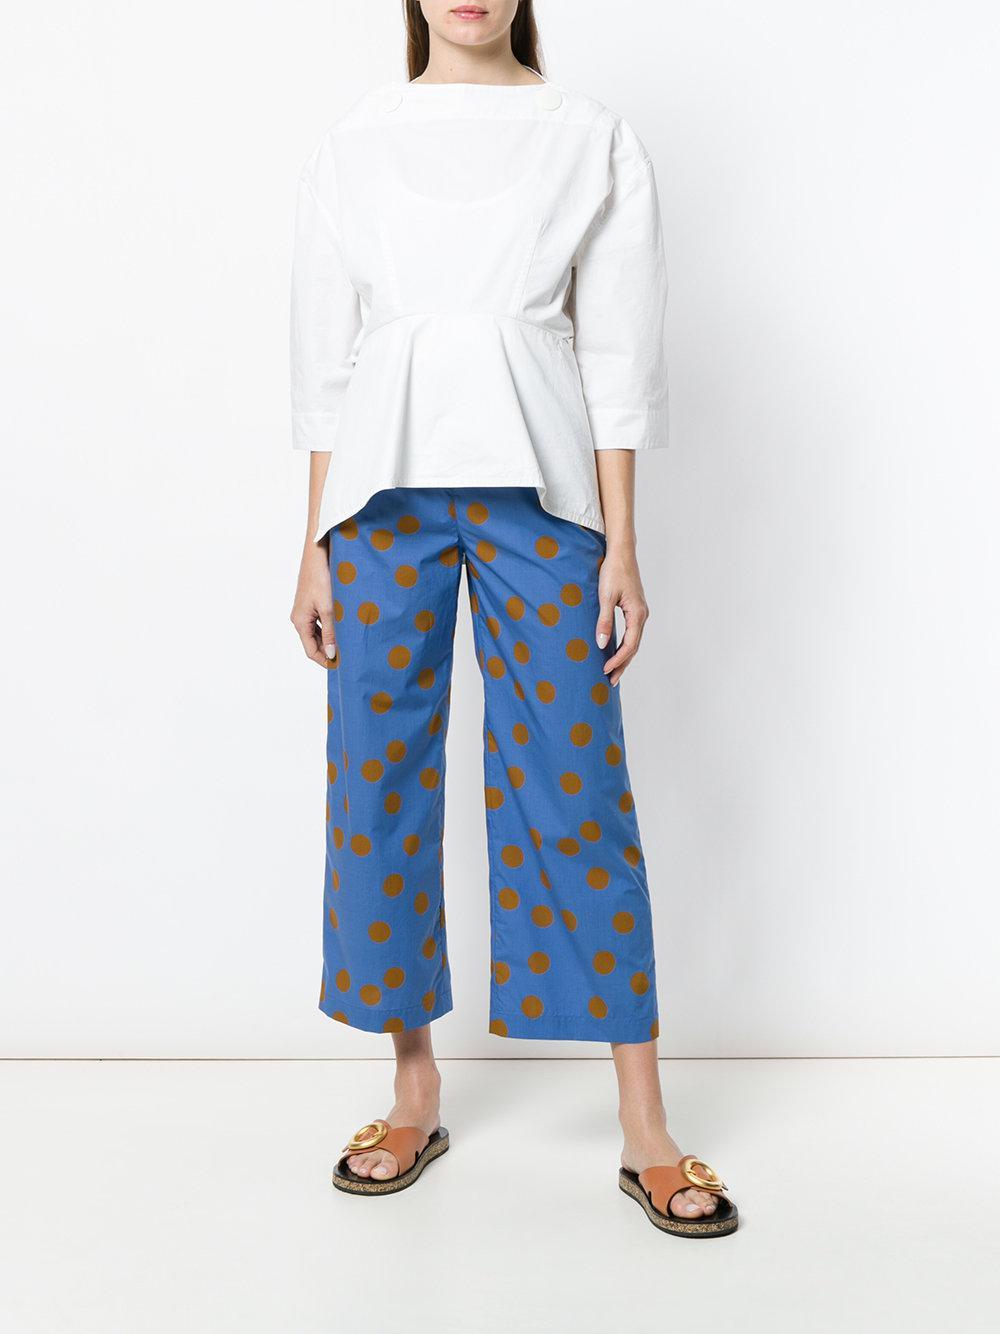 Pantalón Lyst lunares de Aspesi azules HwAU8TqHg